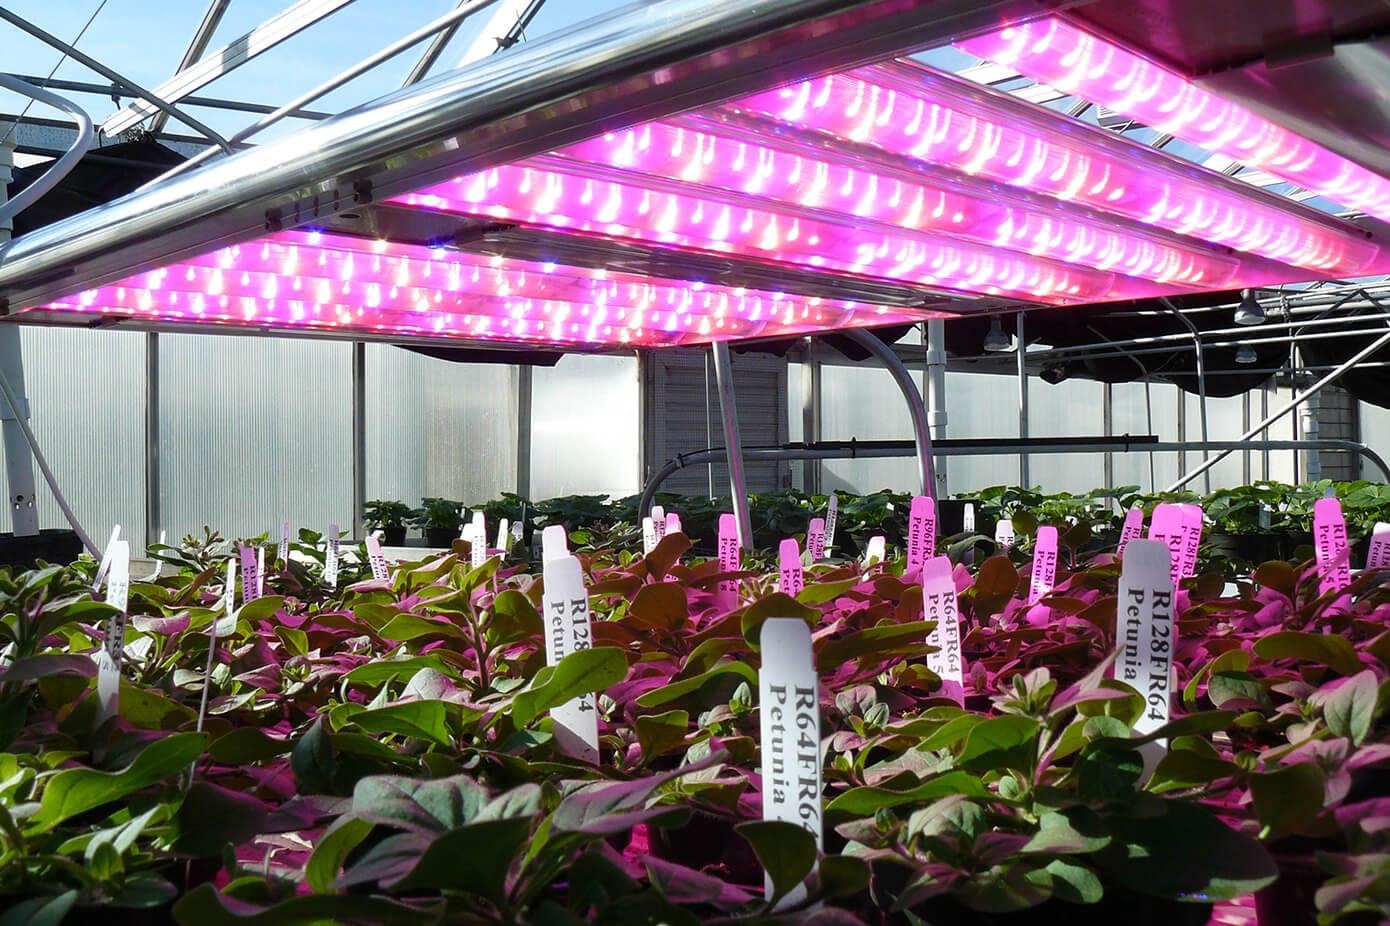 lighting_horticulture_LEDs_spectral_sensor_technology_dam-499395_1390x956